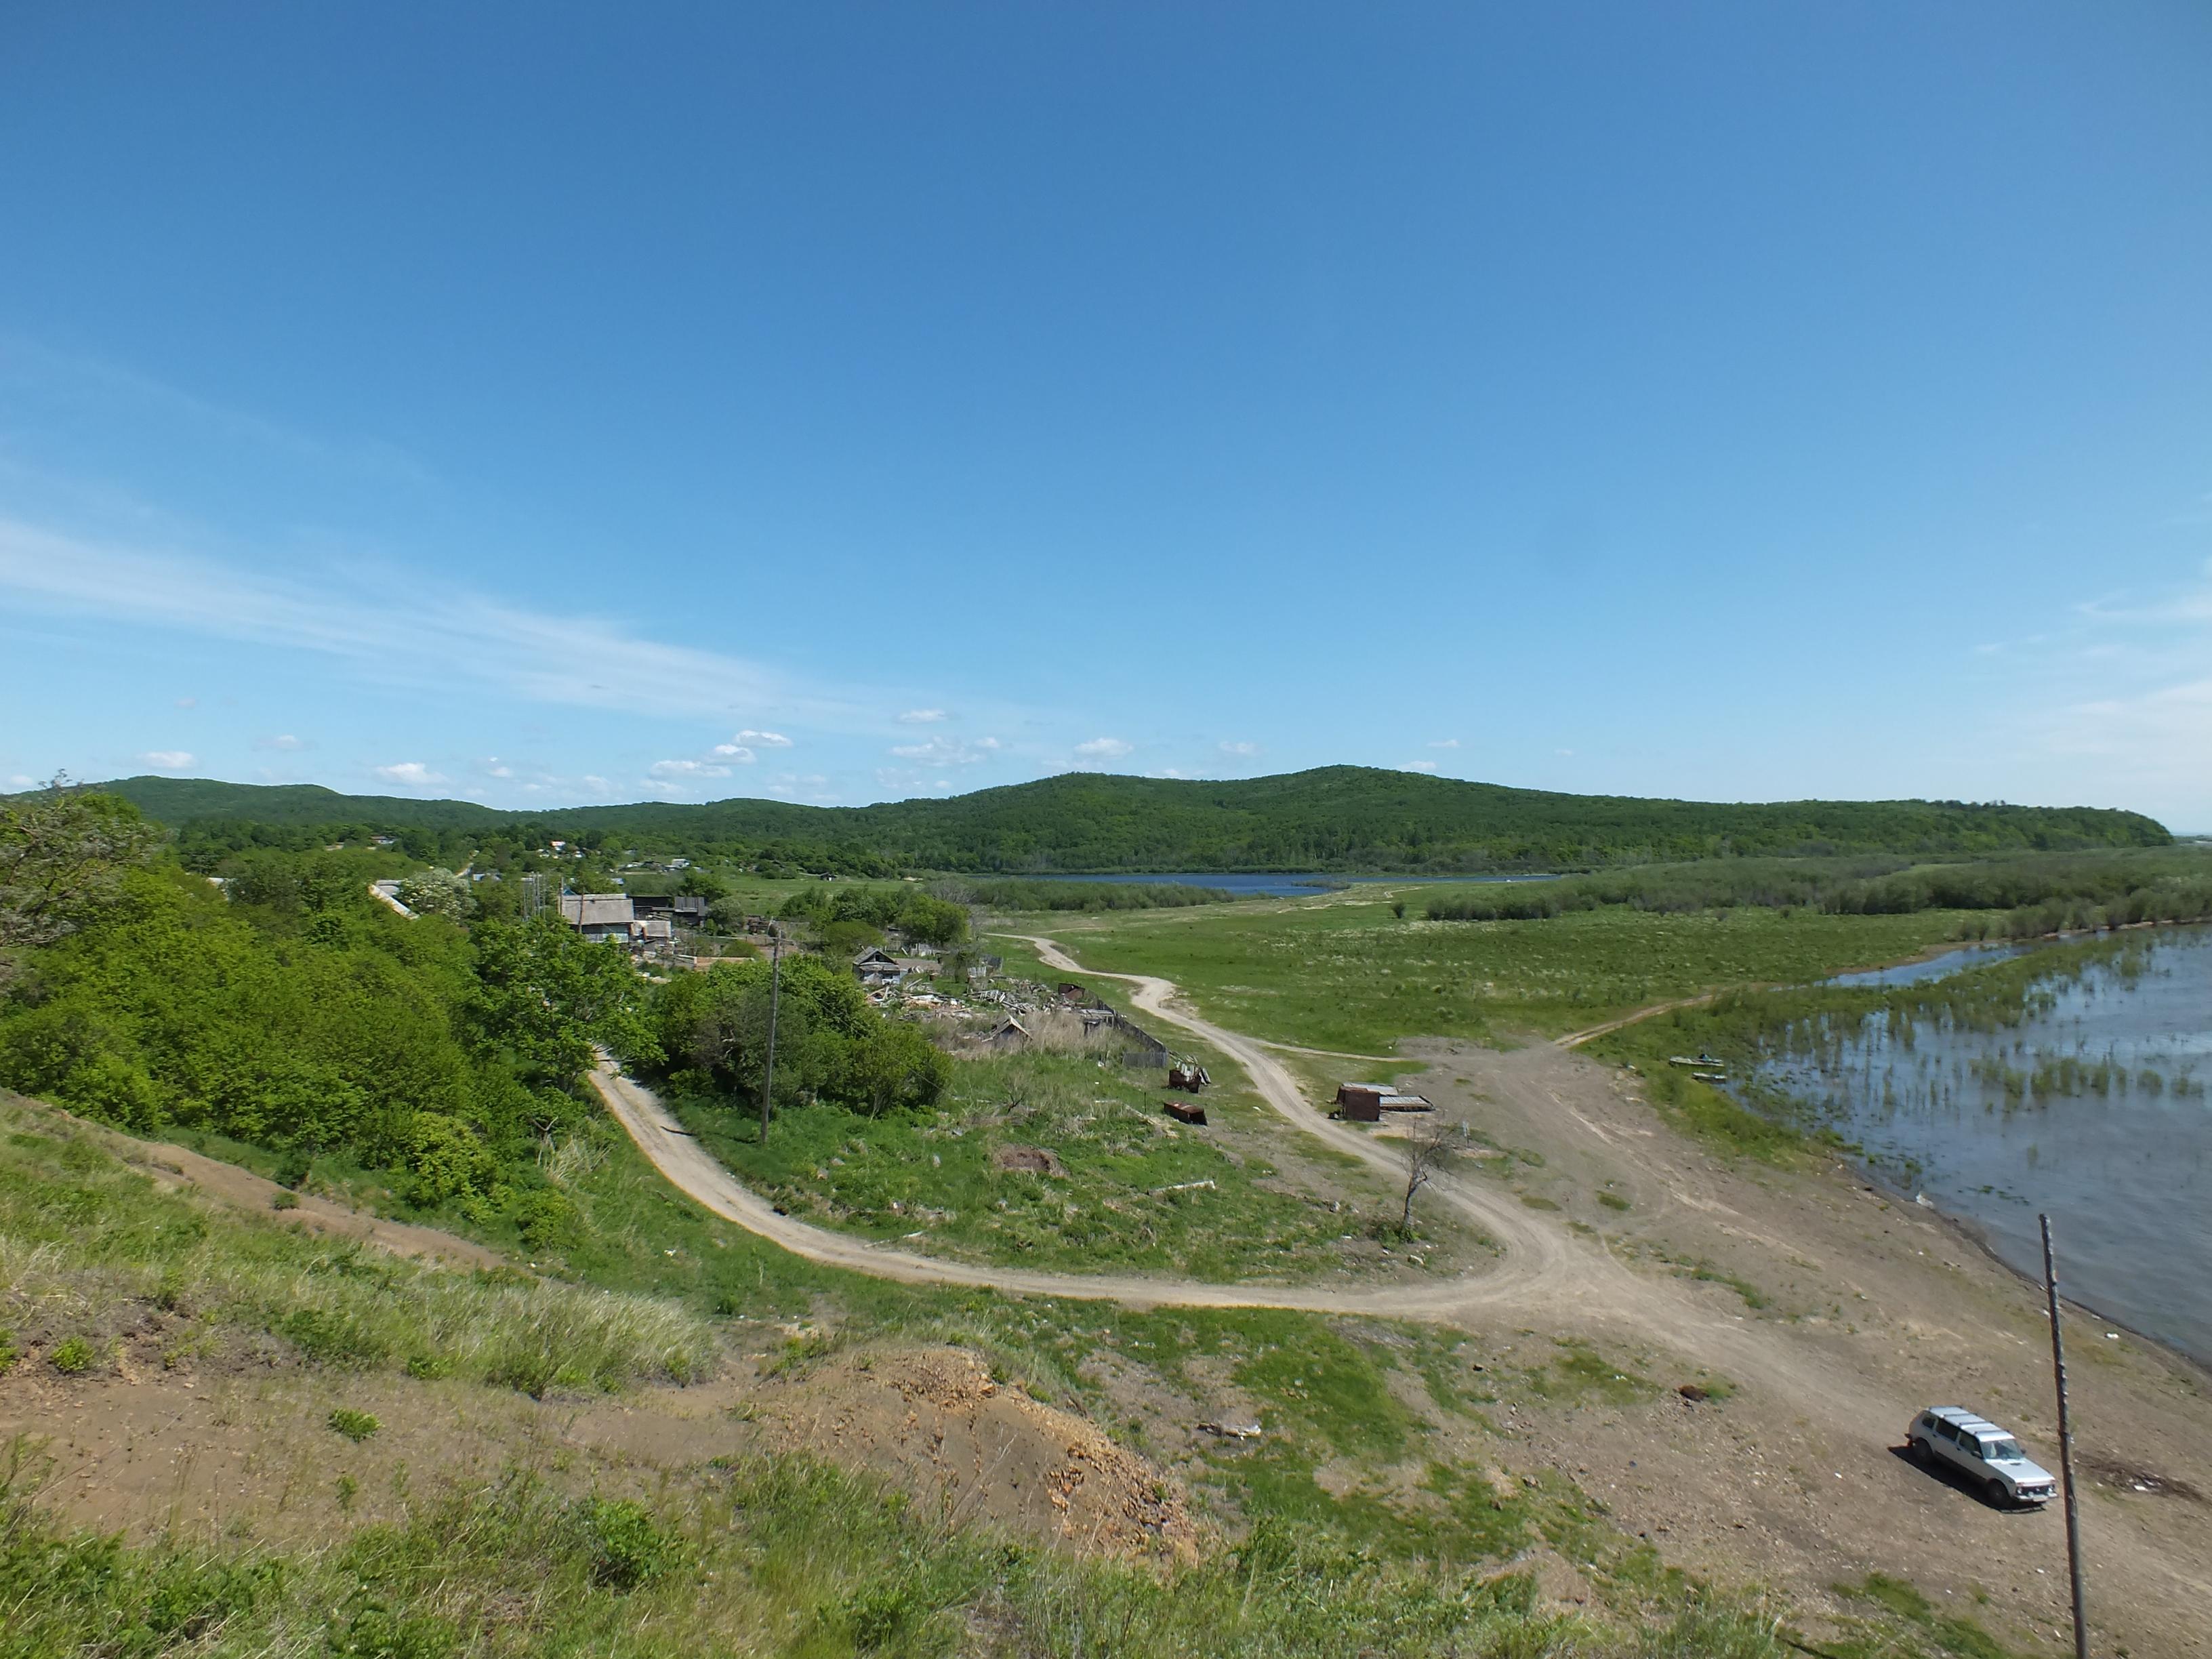 Село малмыж хабаровский край старые фото